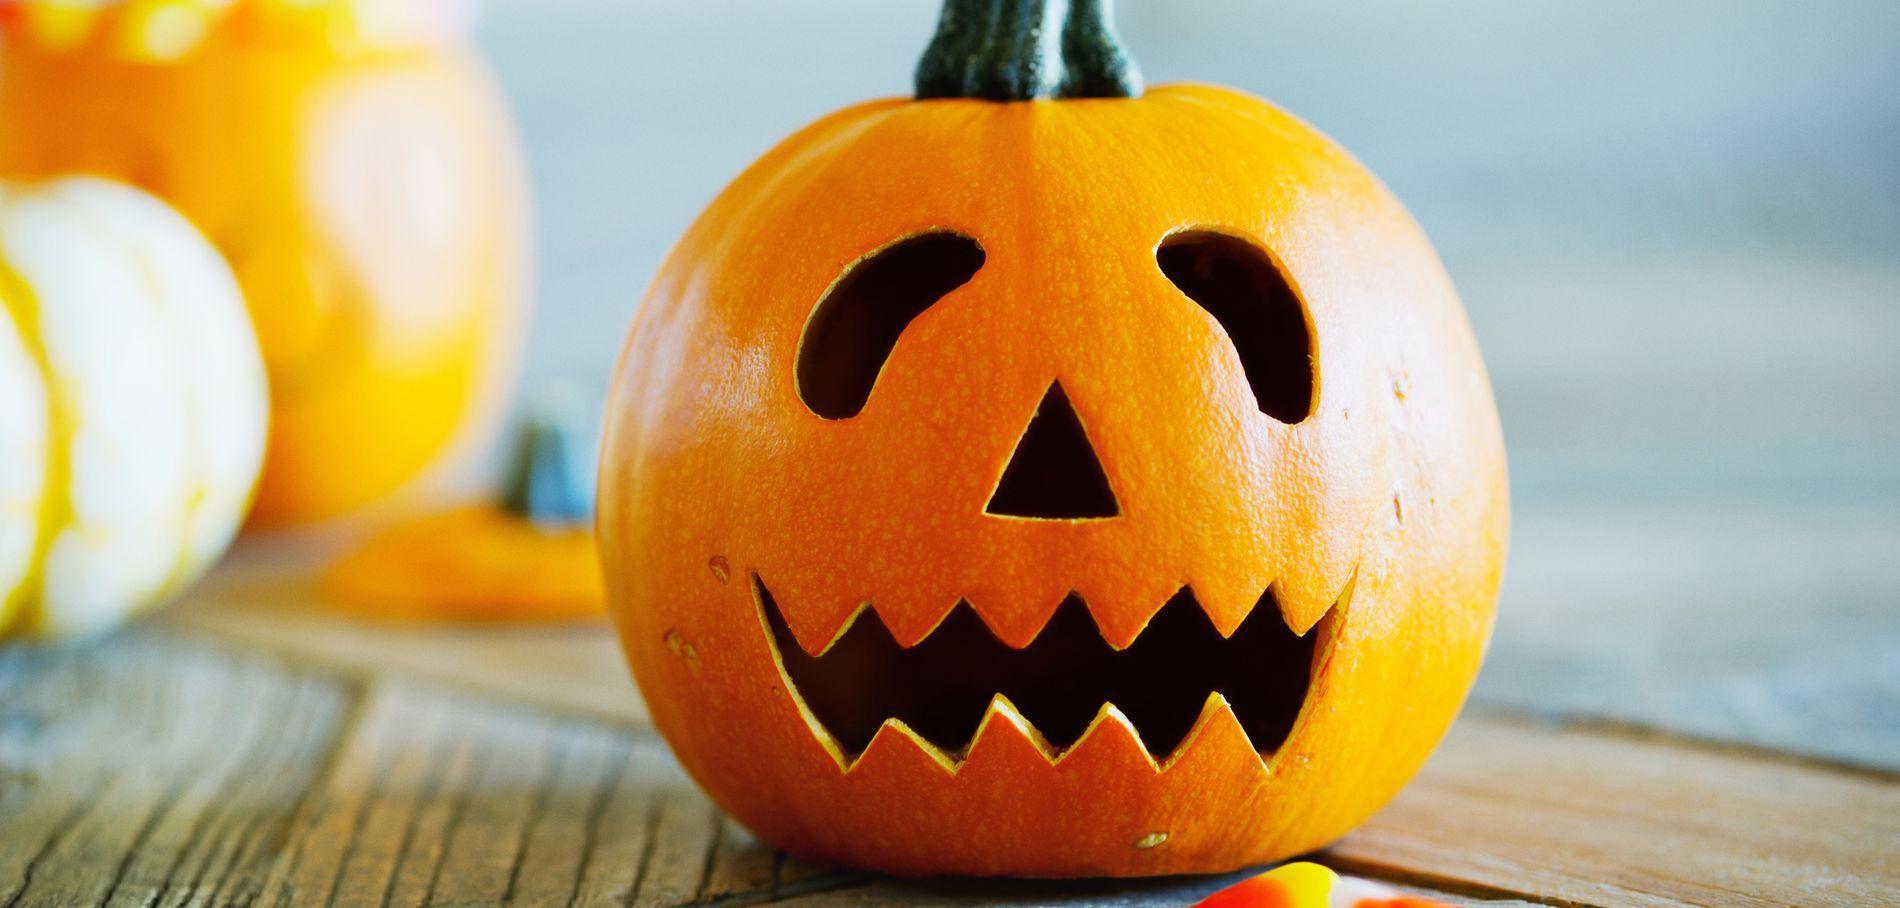 Традиционная тыква на хэллоуин